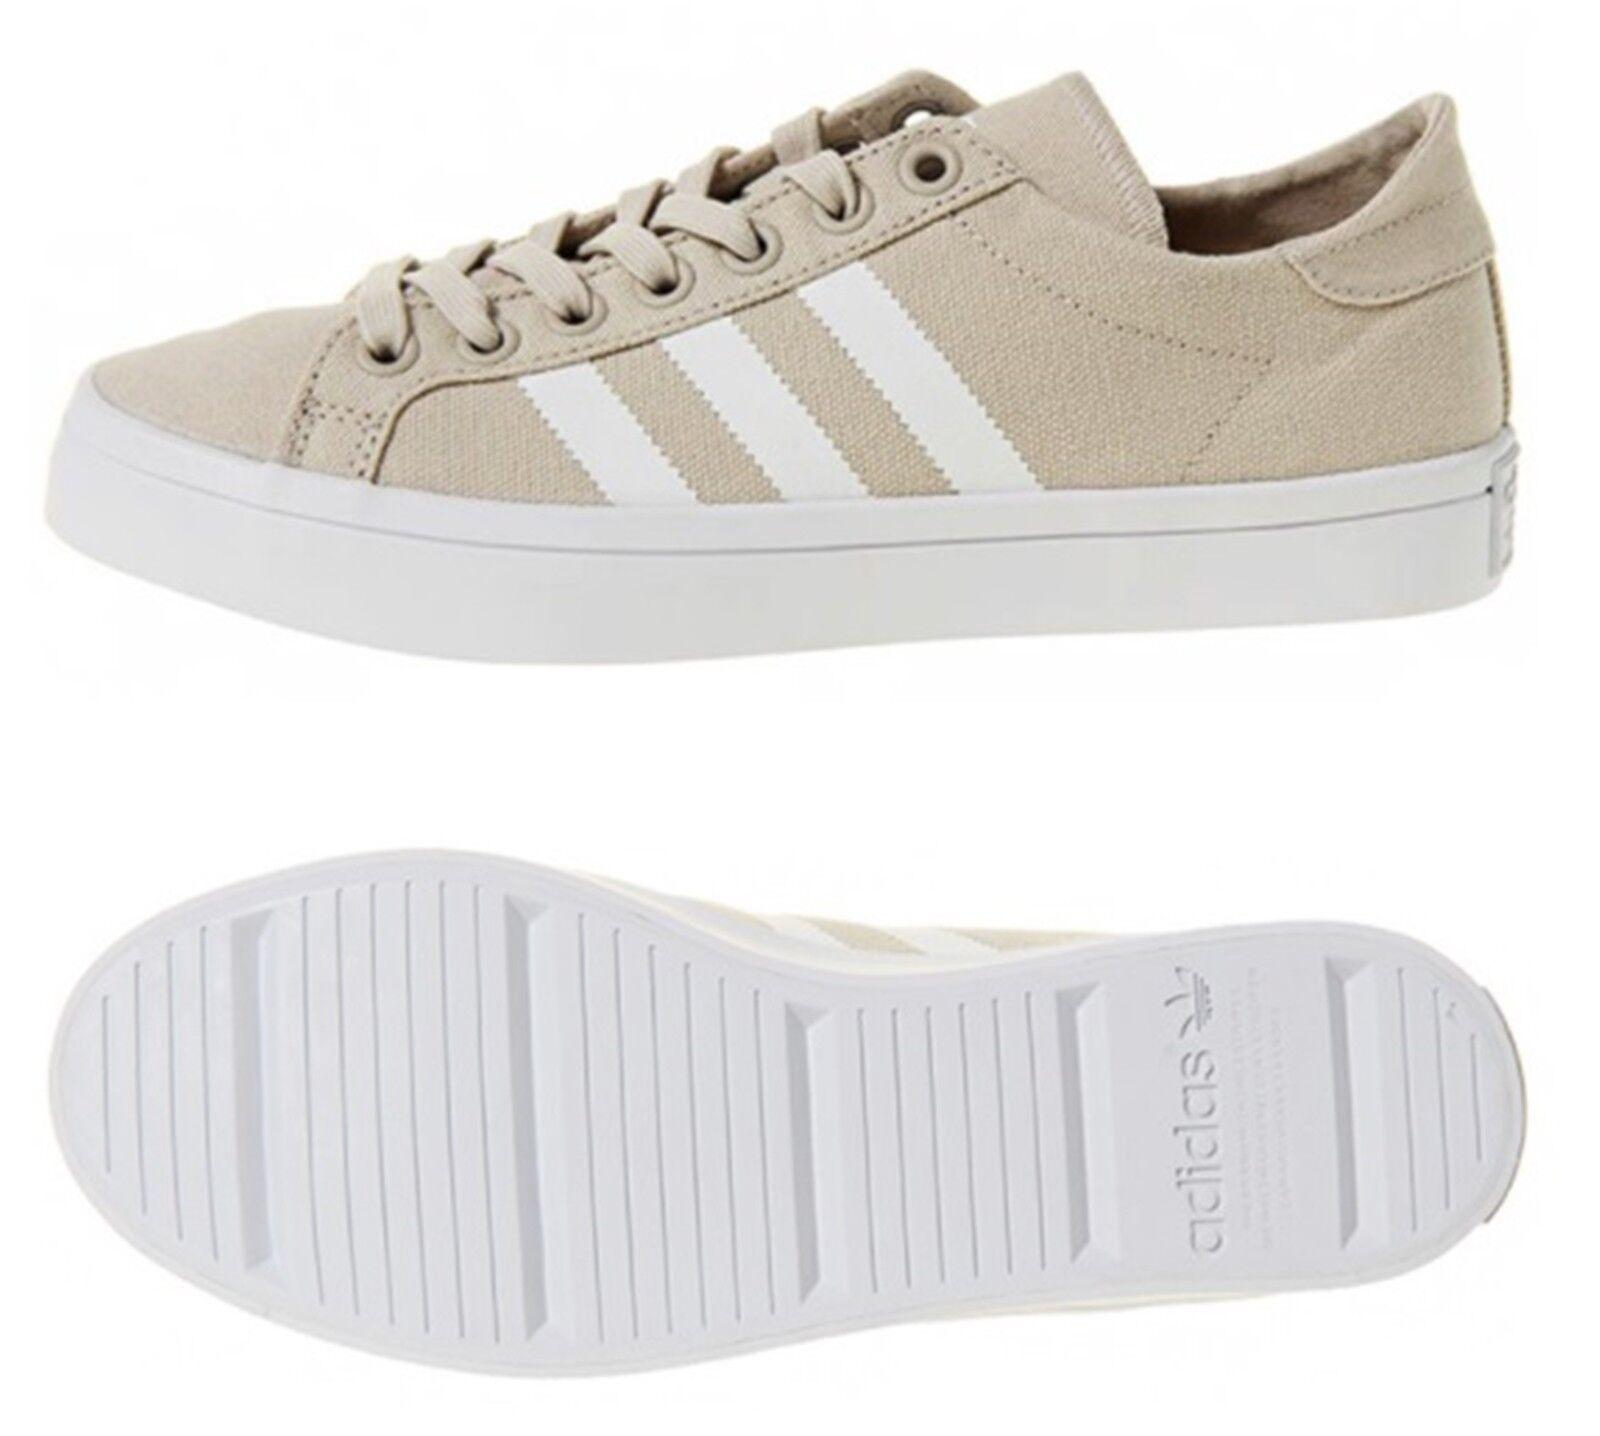 249782fe9677a Adidas Men Originals Court Vantage shoes Beige Sneakers BB5207 Training  Running nzdxkj8872-Men